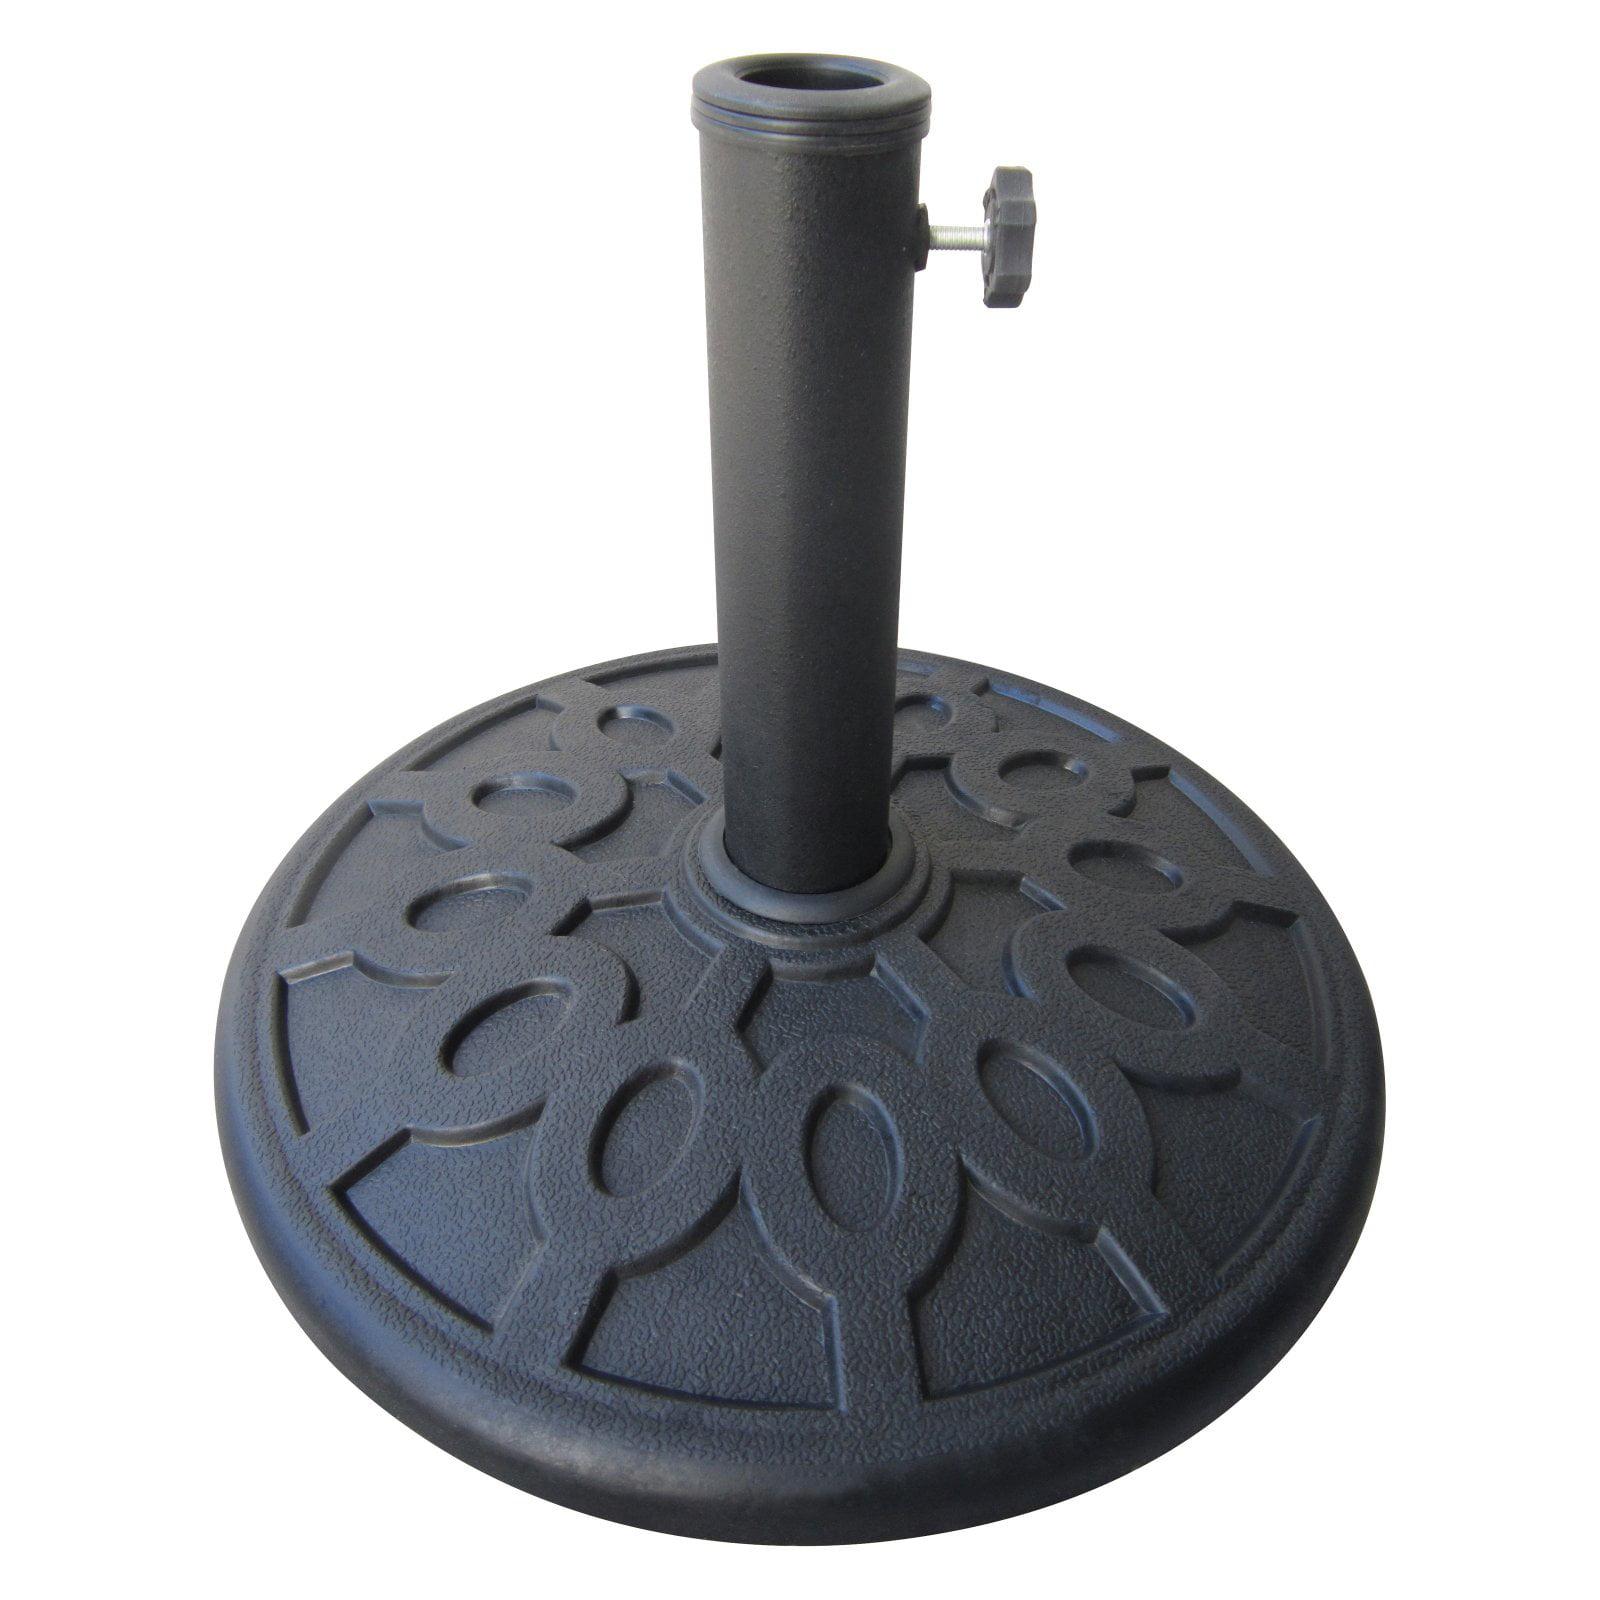 Bond Regency 17.6 lb. Resin Patio Umbrella Stand